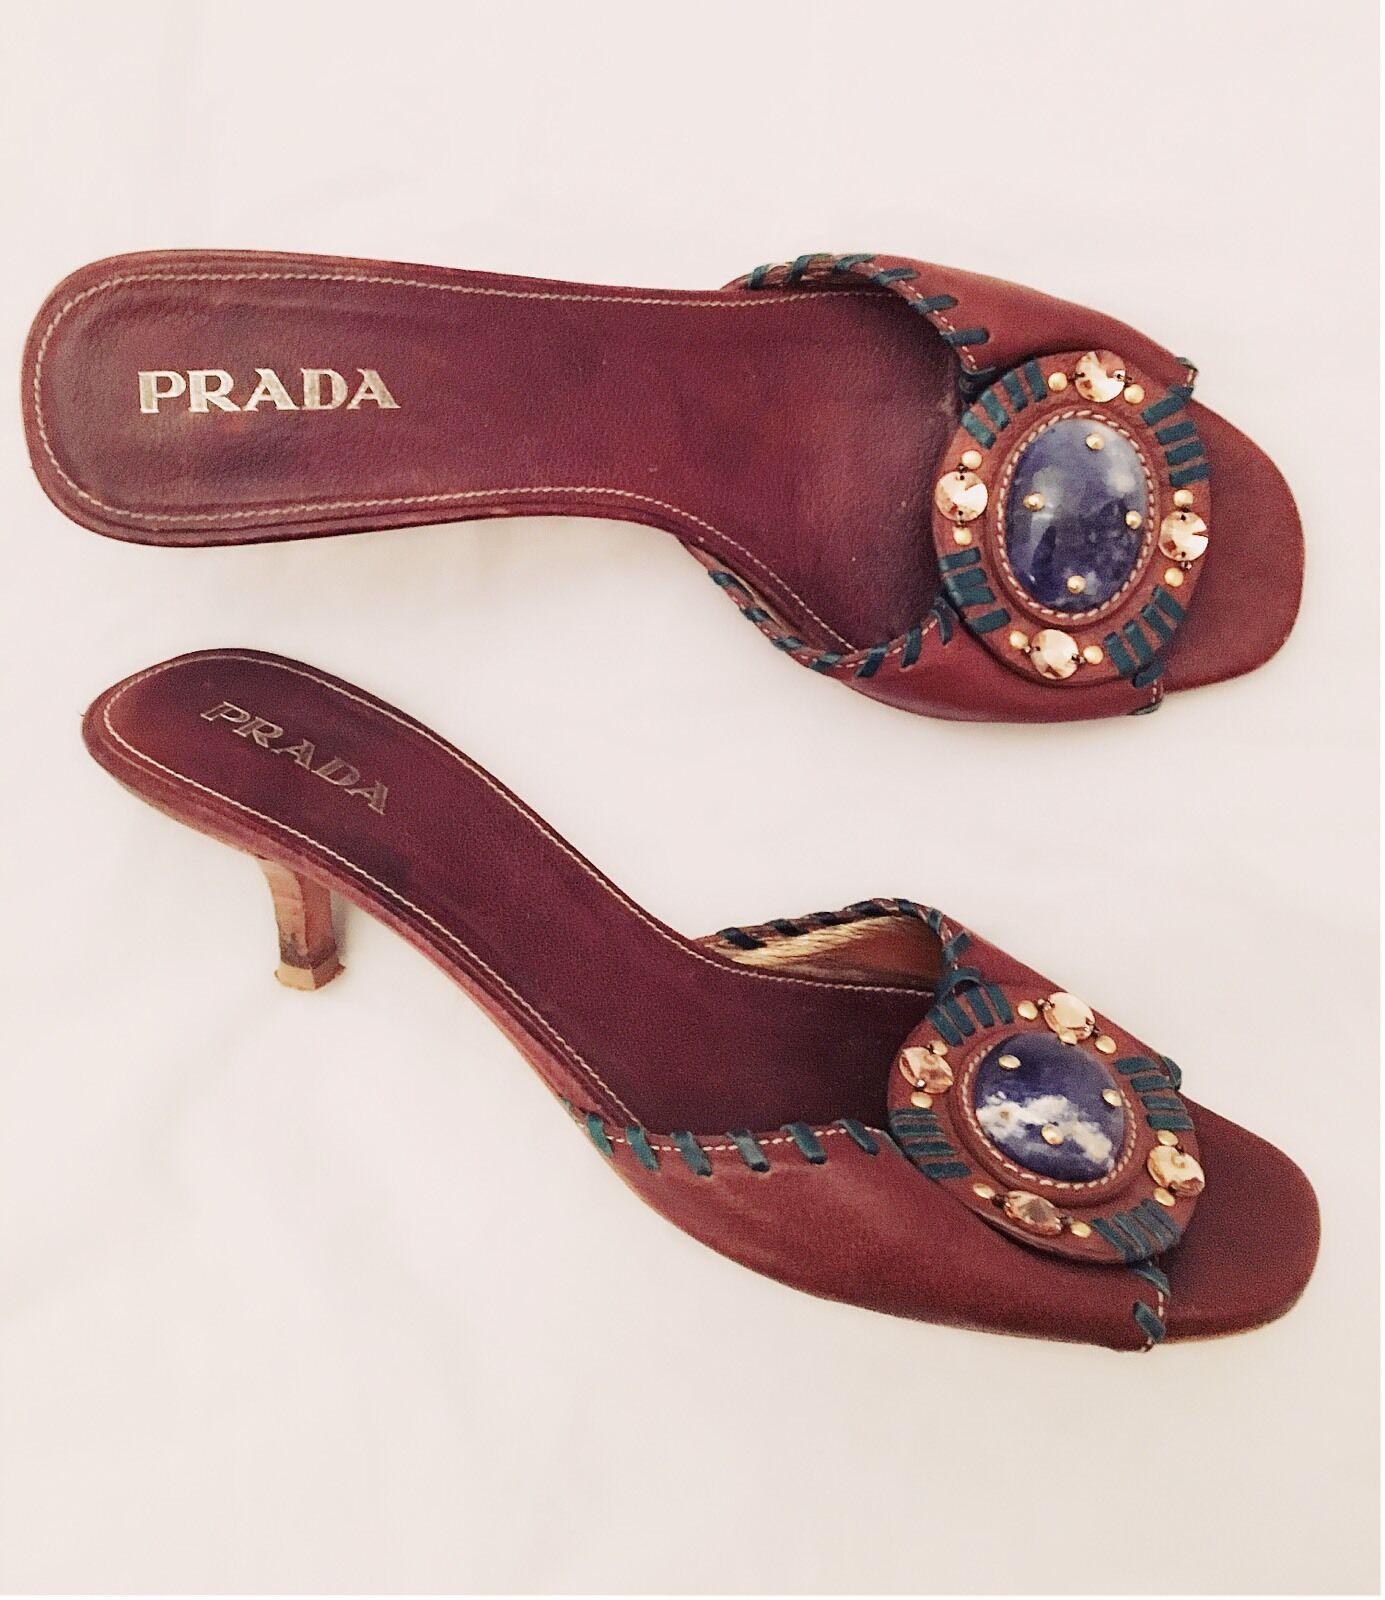 Women's - PRADA - Lapis Lazuli Brown Leather Kitten Heel Slides Sandals 7.5 / 38